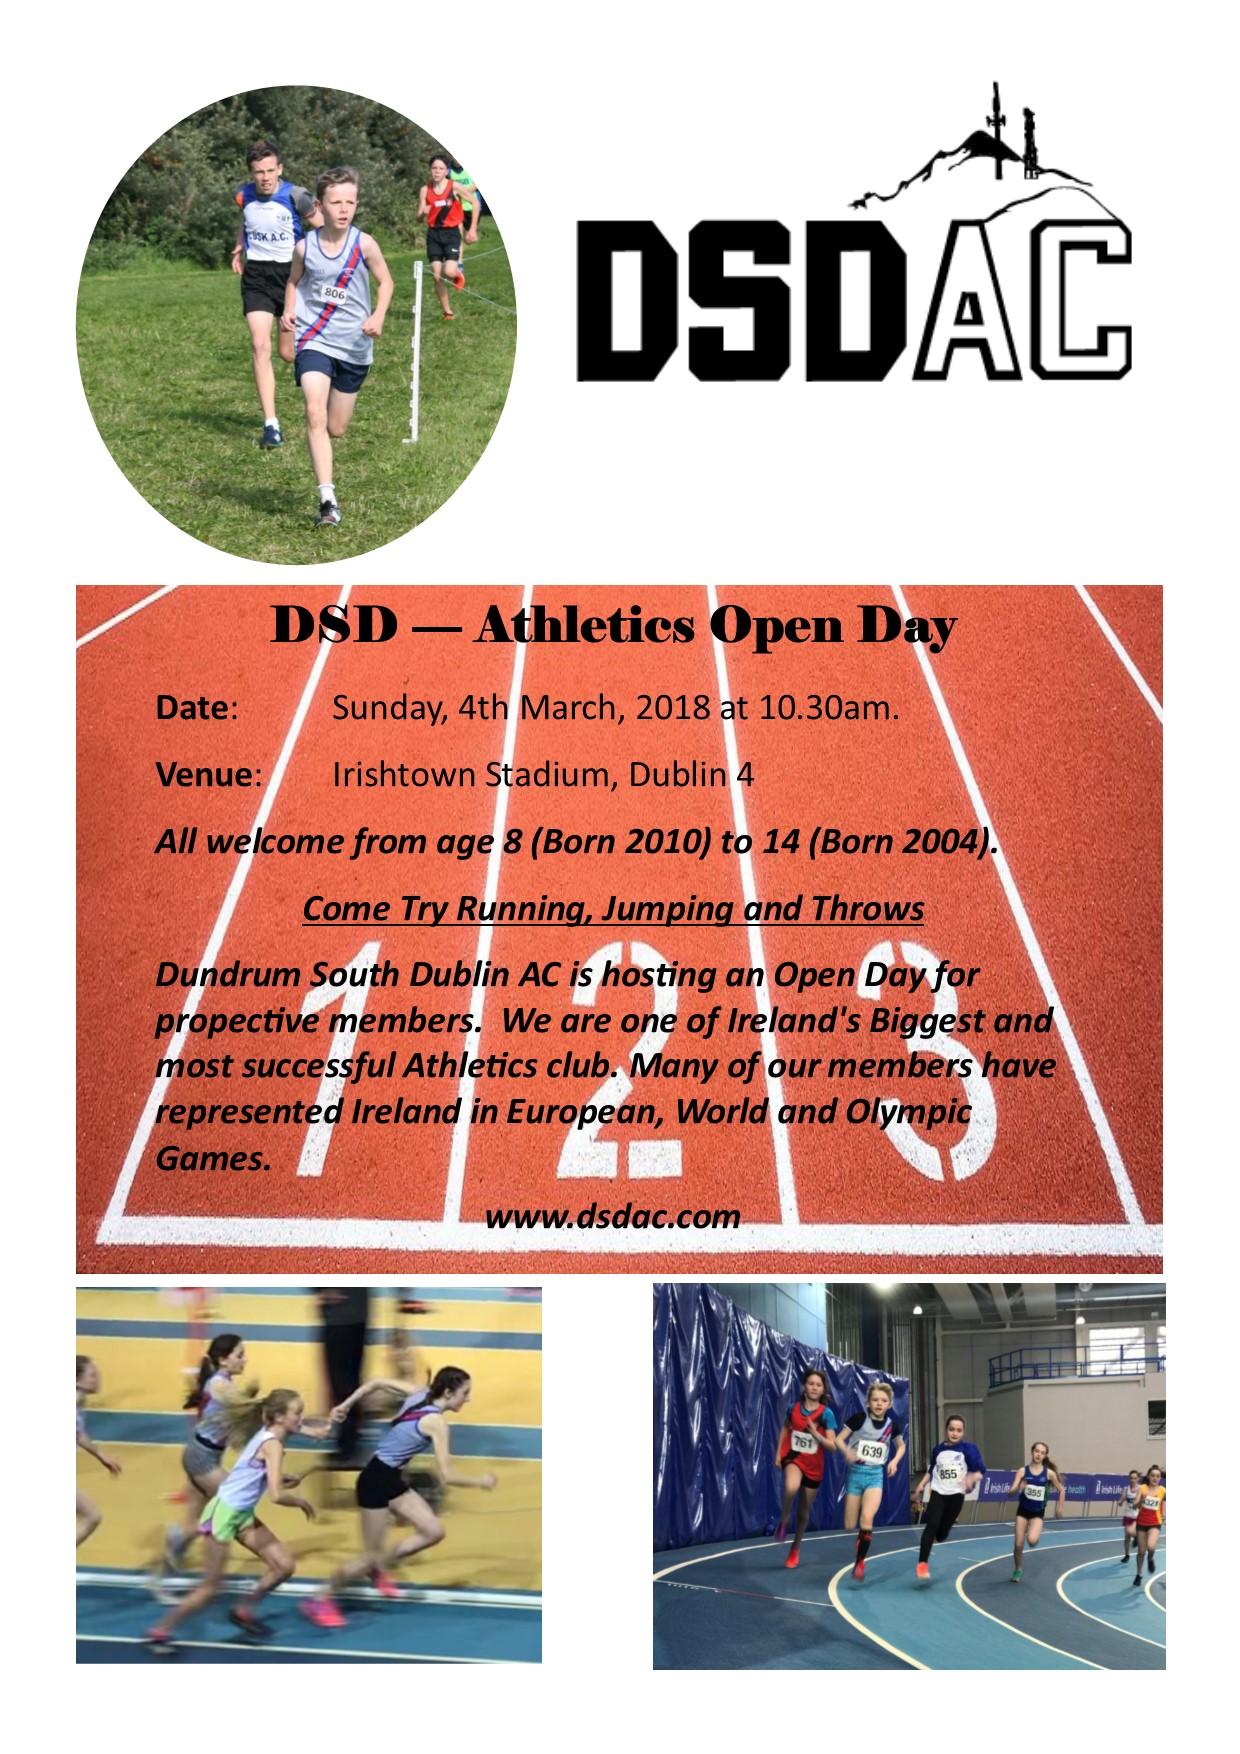 DSD - Open Day Flyer 2018 2.jpg